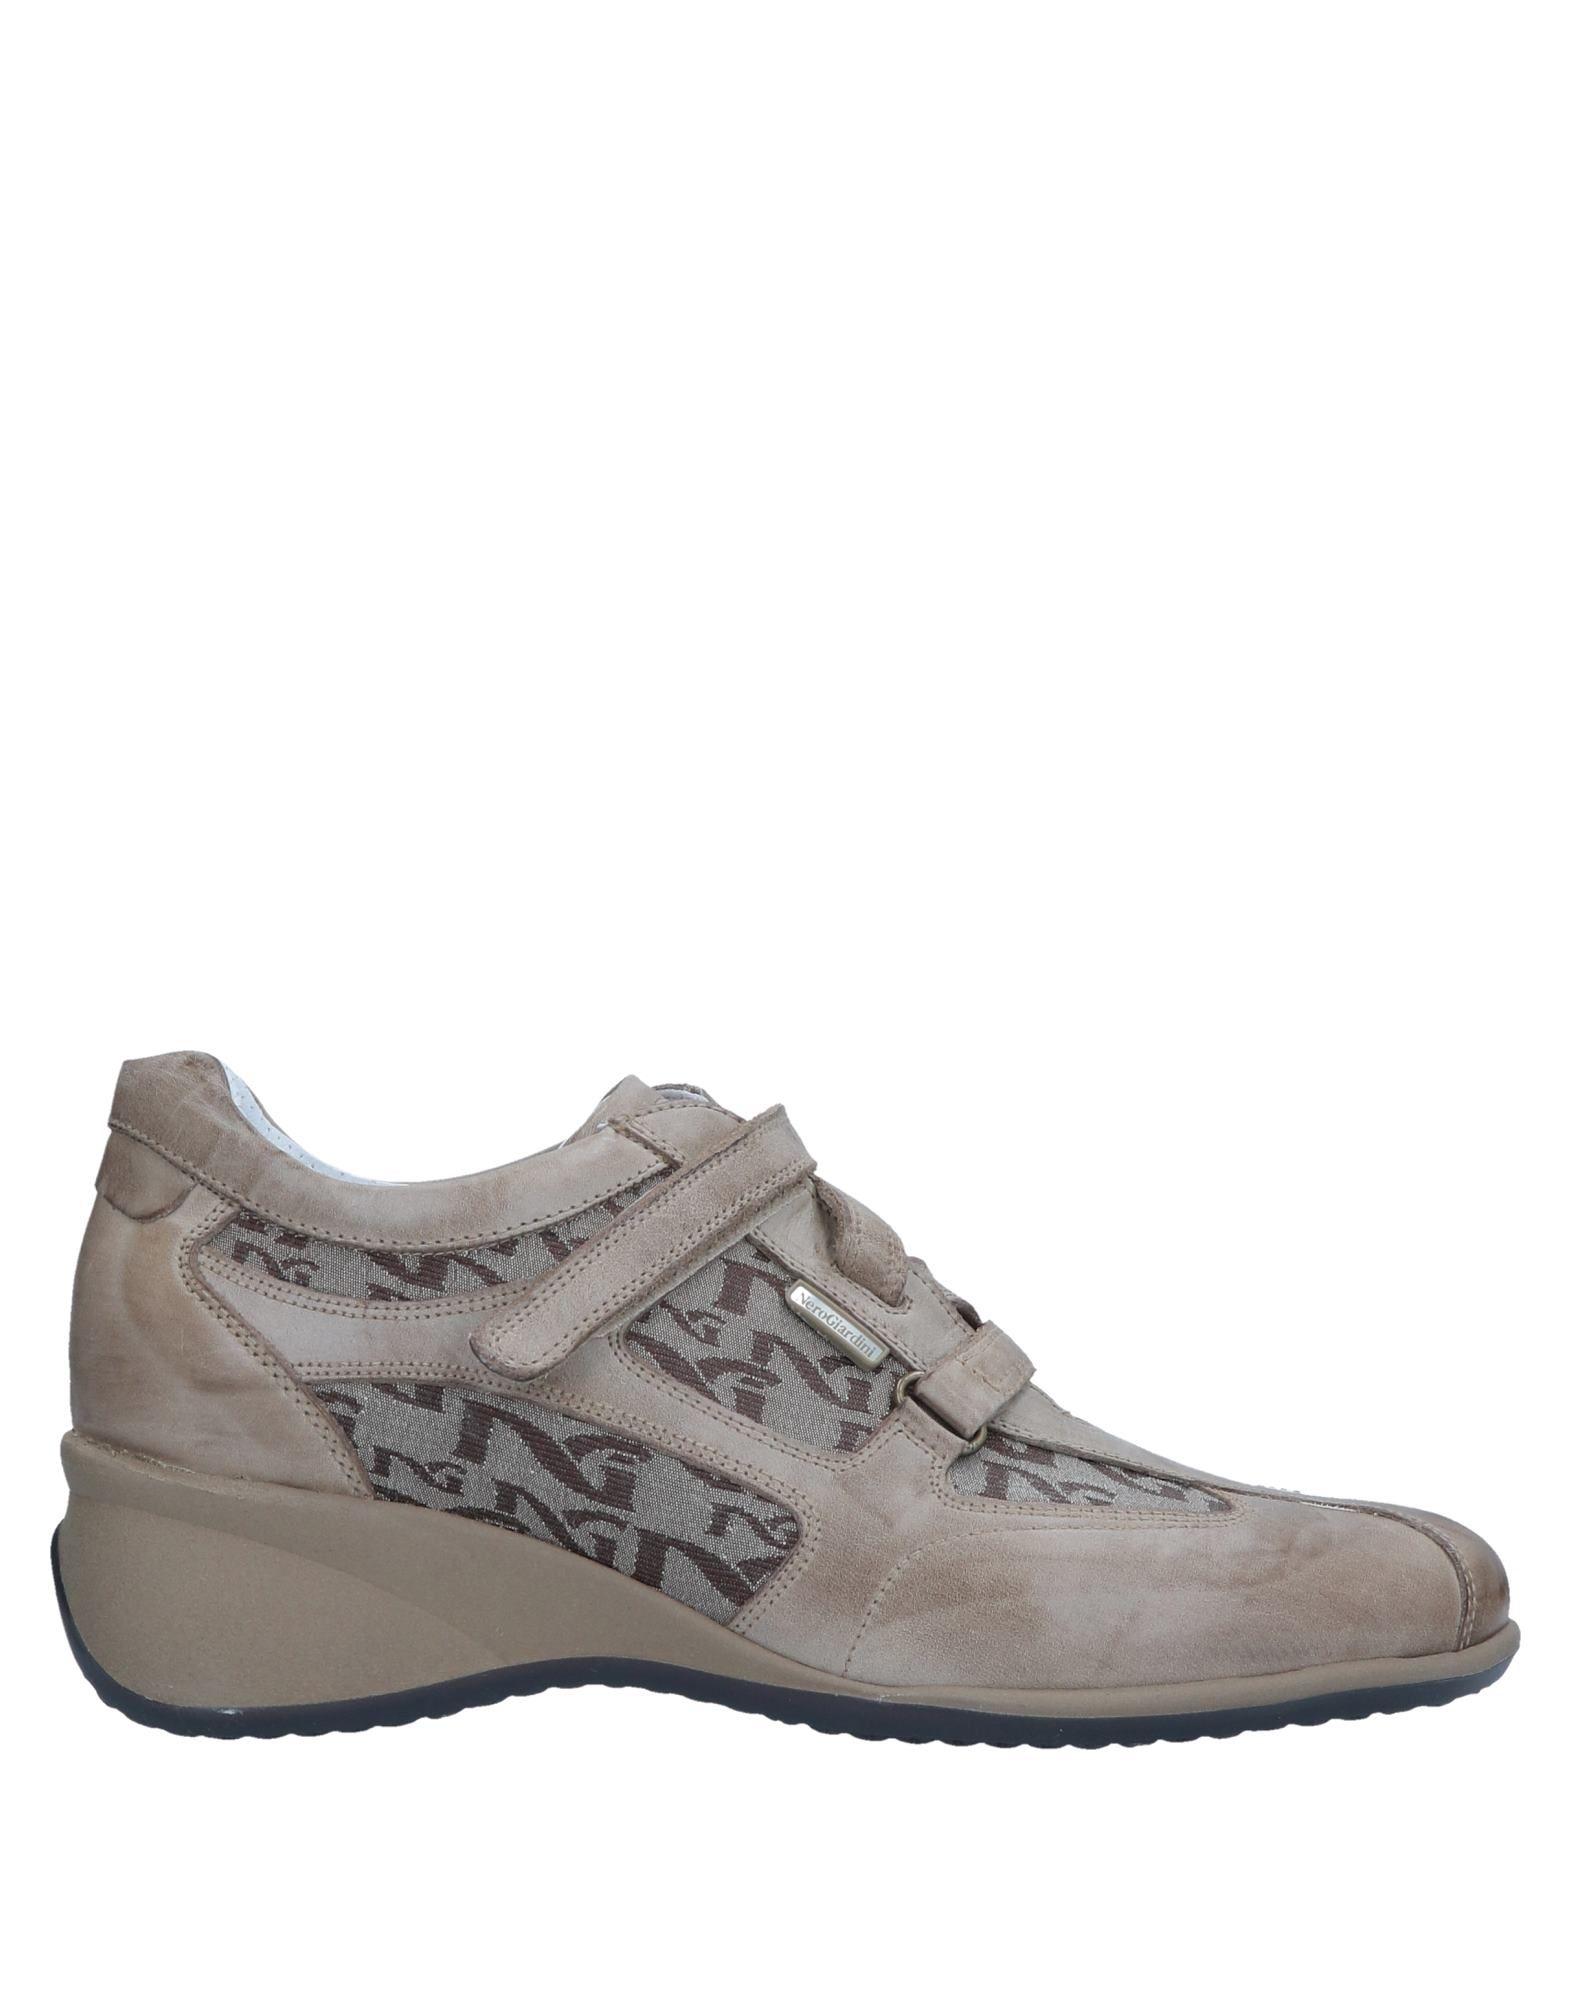 Ng Nero Giardini Sneakers Qualität Damen  11548904ND Gute Qualität Sneakers beliebte Schuhe 855435